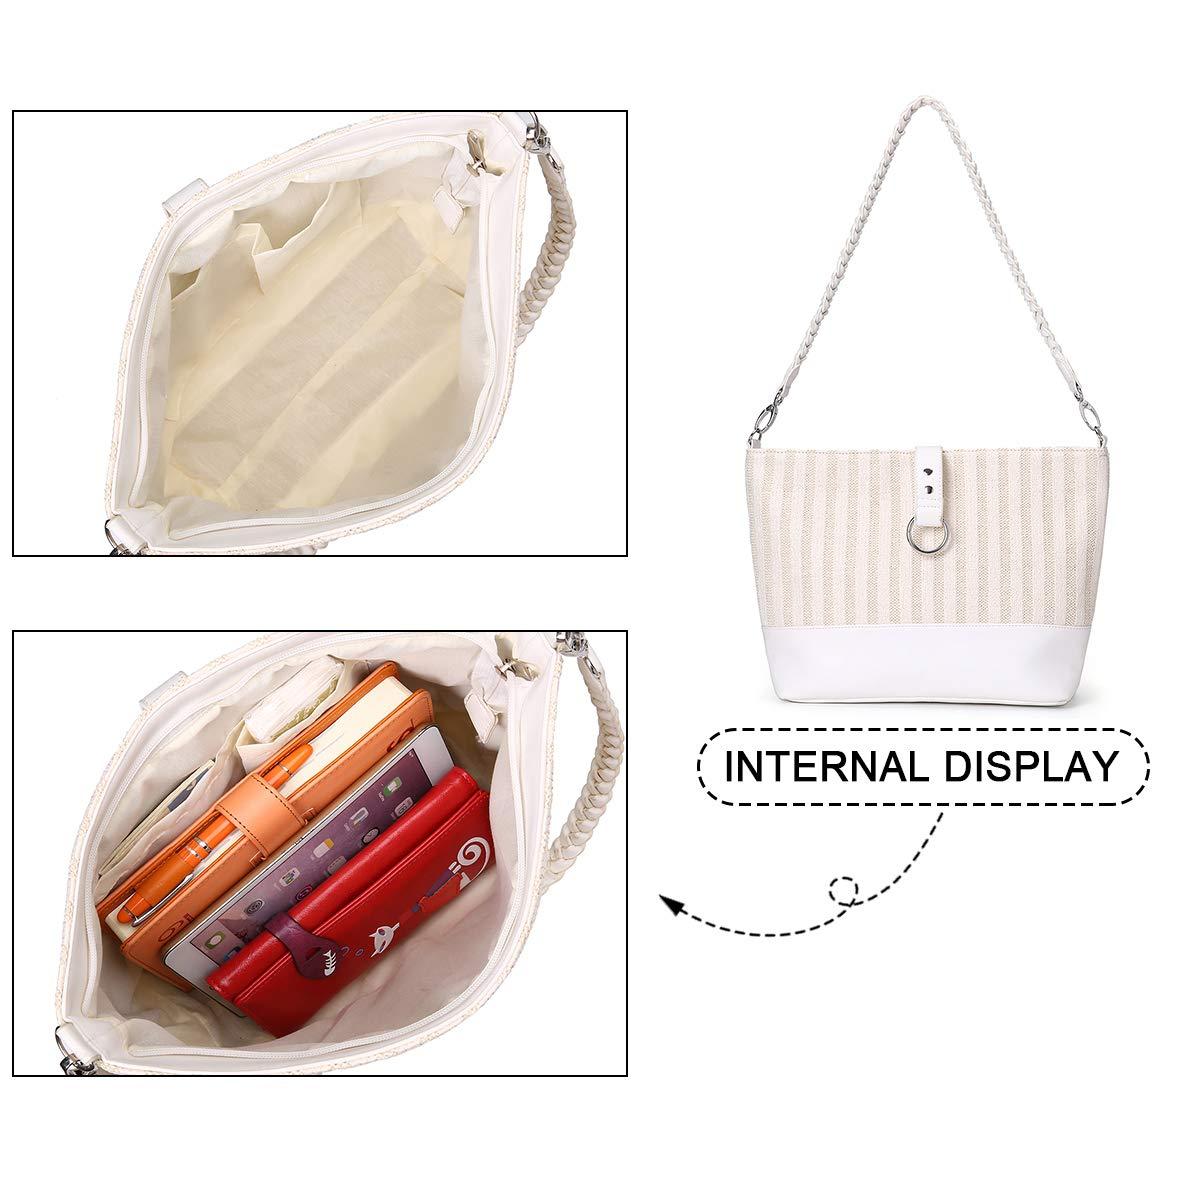 Straw Shoulder Bag Kadell Straw Clutch Women Handmade Straw Crossbody Bag Summer Beach Envelope Purse Wallet